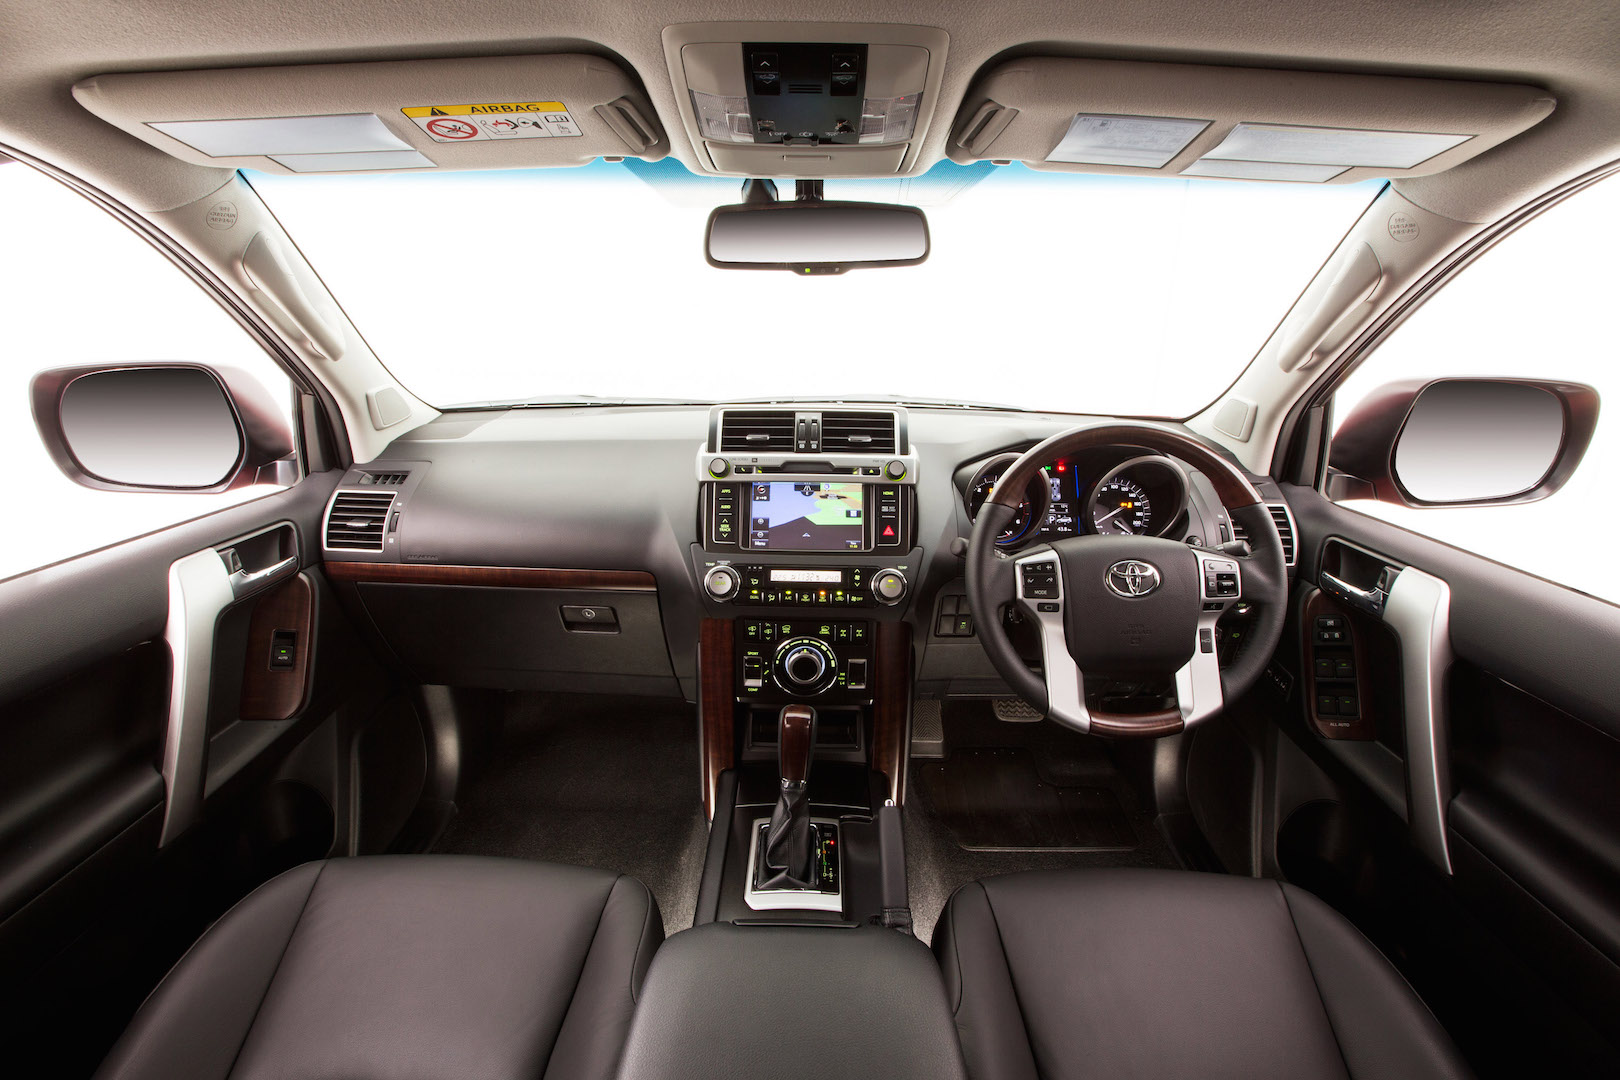 2016 Toyota Land Cruiser Prado: БОЛЬШОЙ ТЕСТ АВТОПАНОРАМЫ